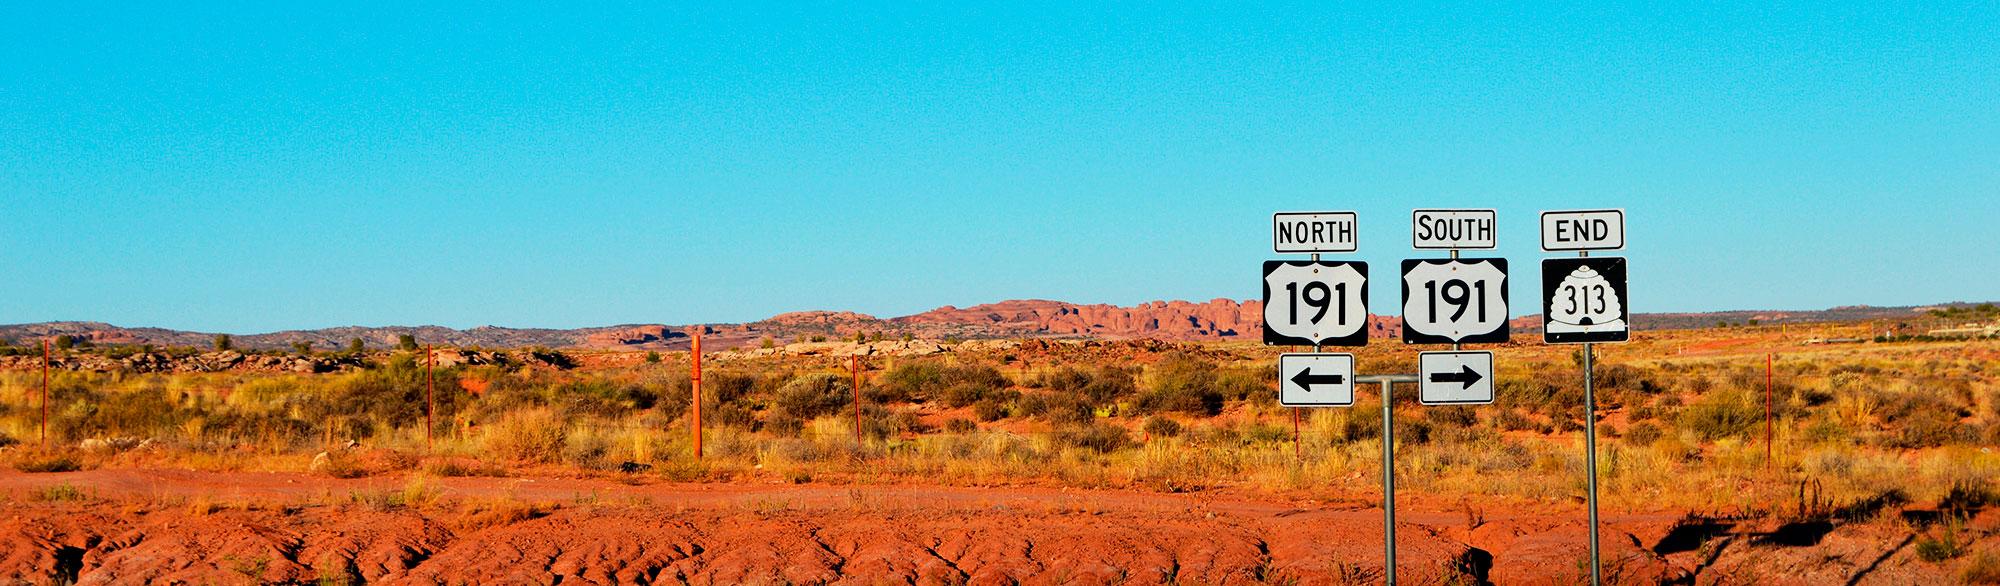 Moab Highway - Amplitudes